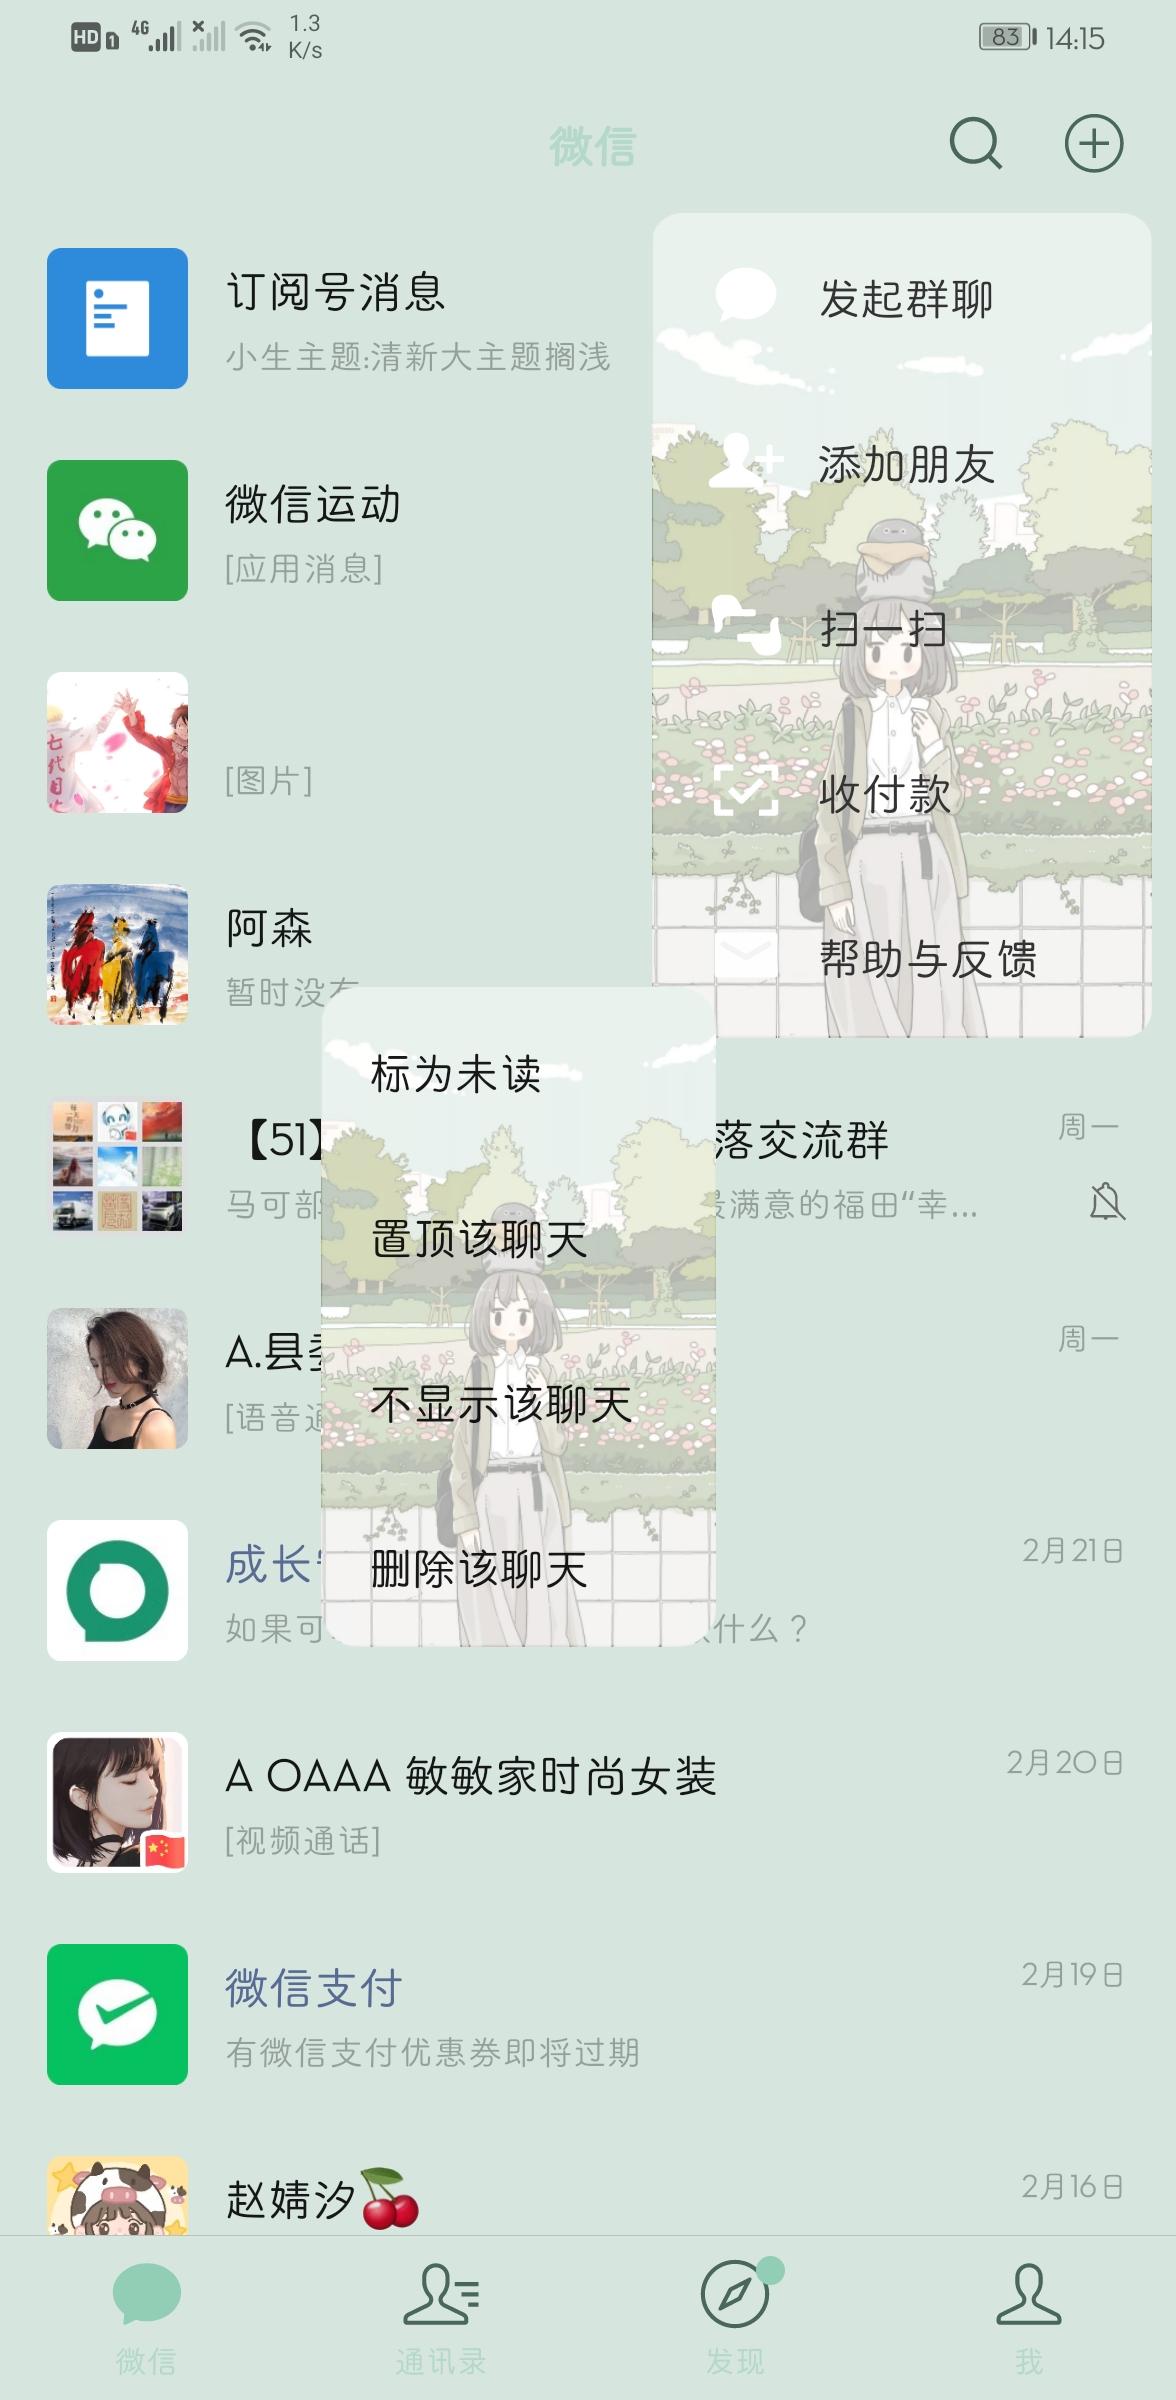 Screenshot_20210226_141552_com.tencent.mm.jpg